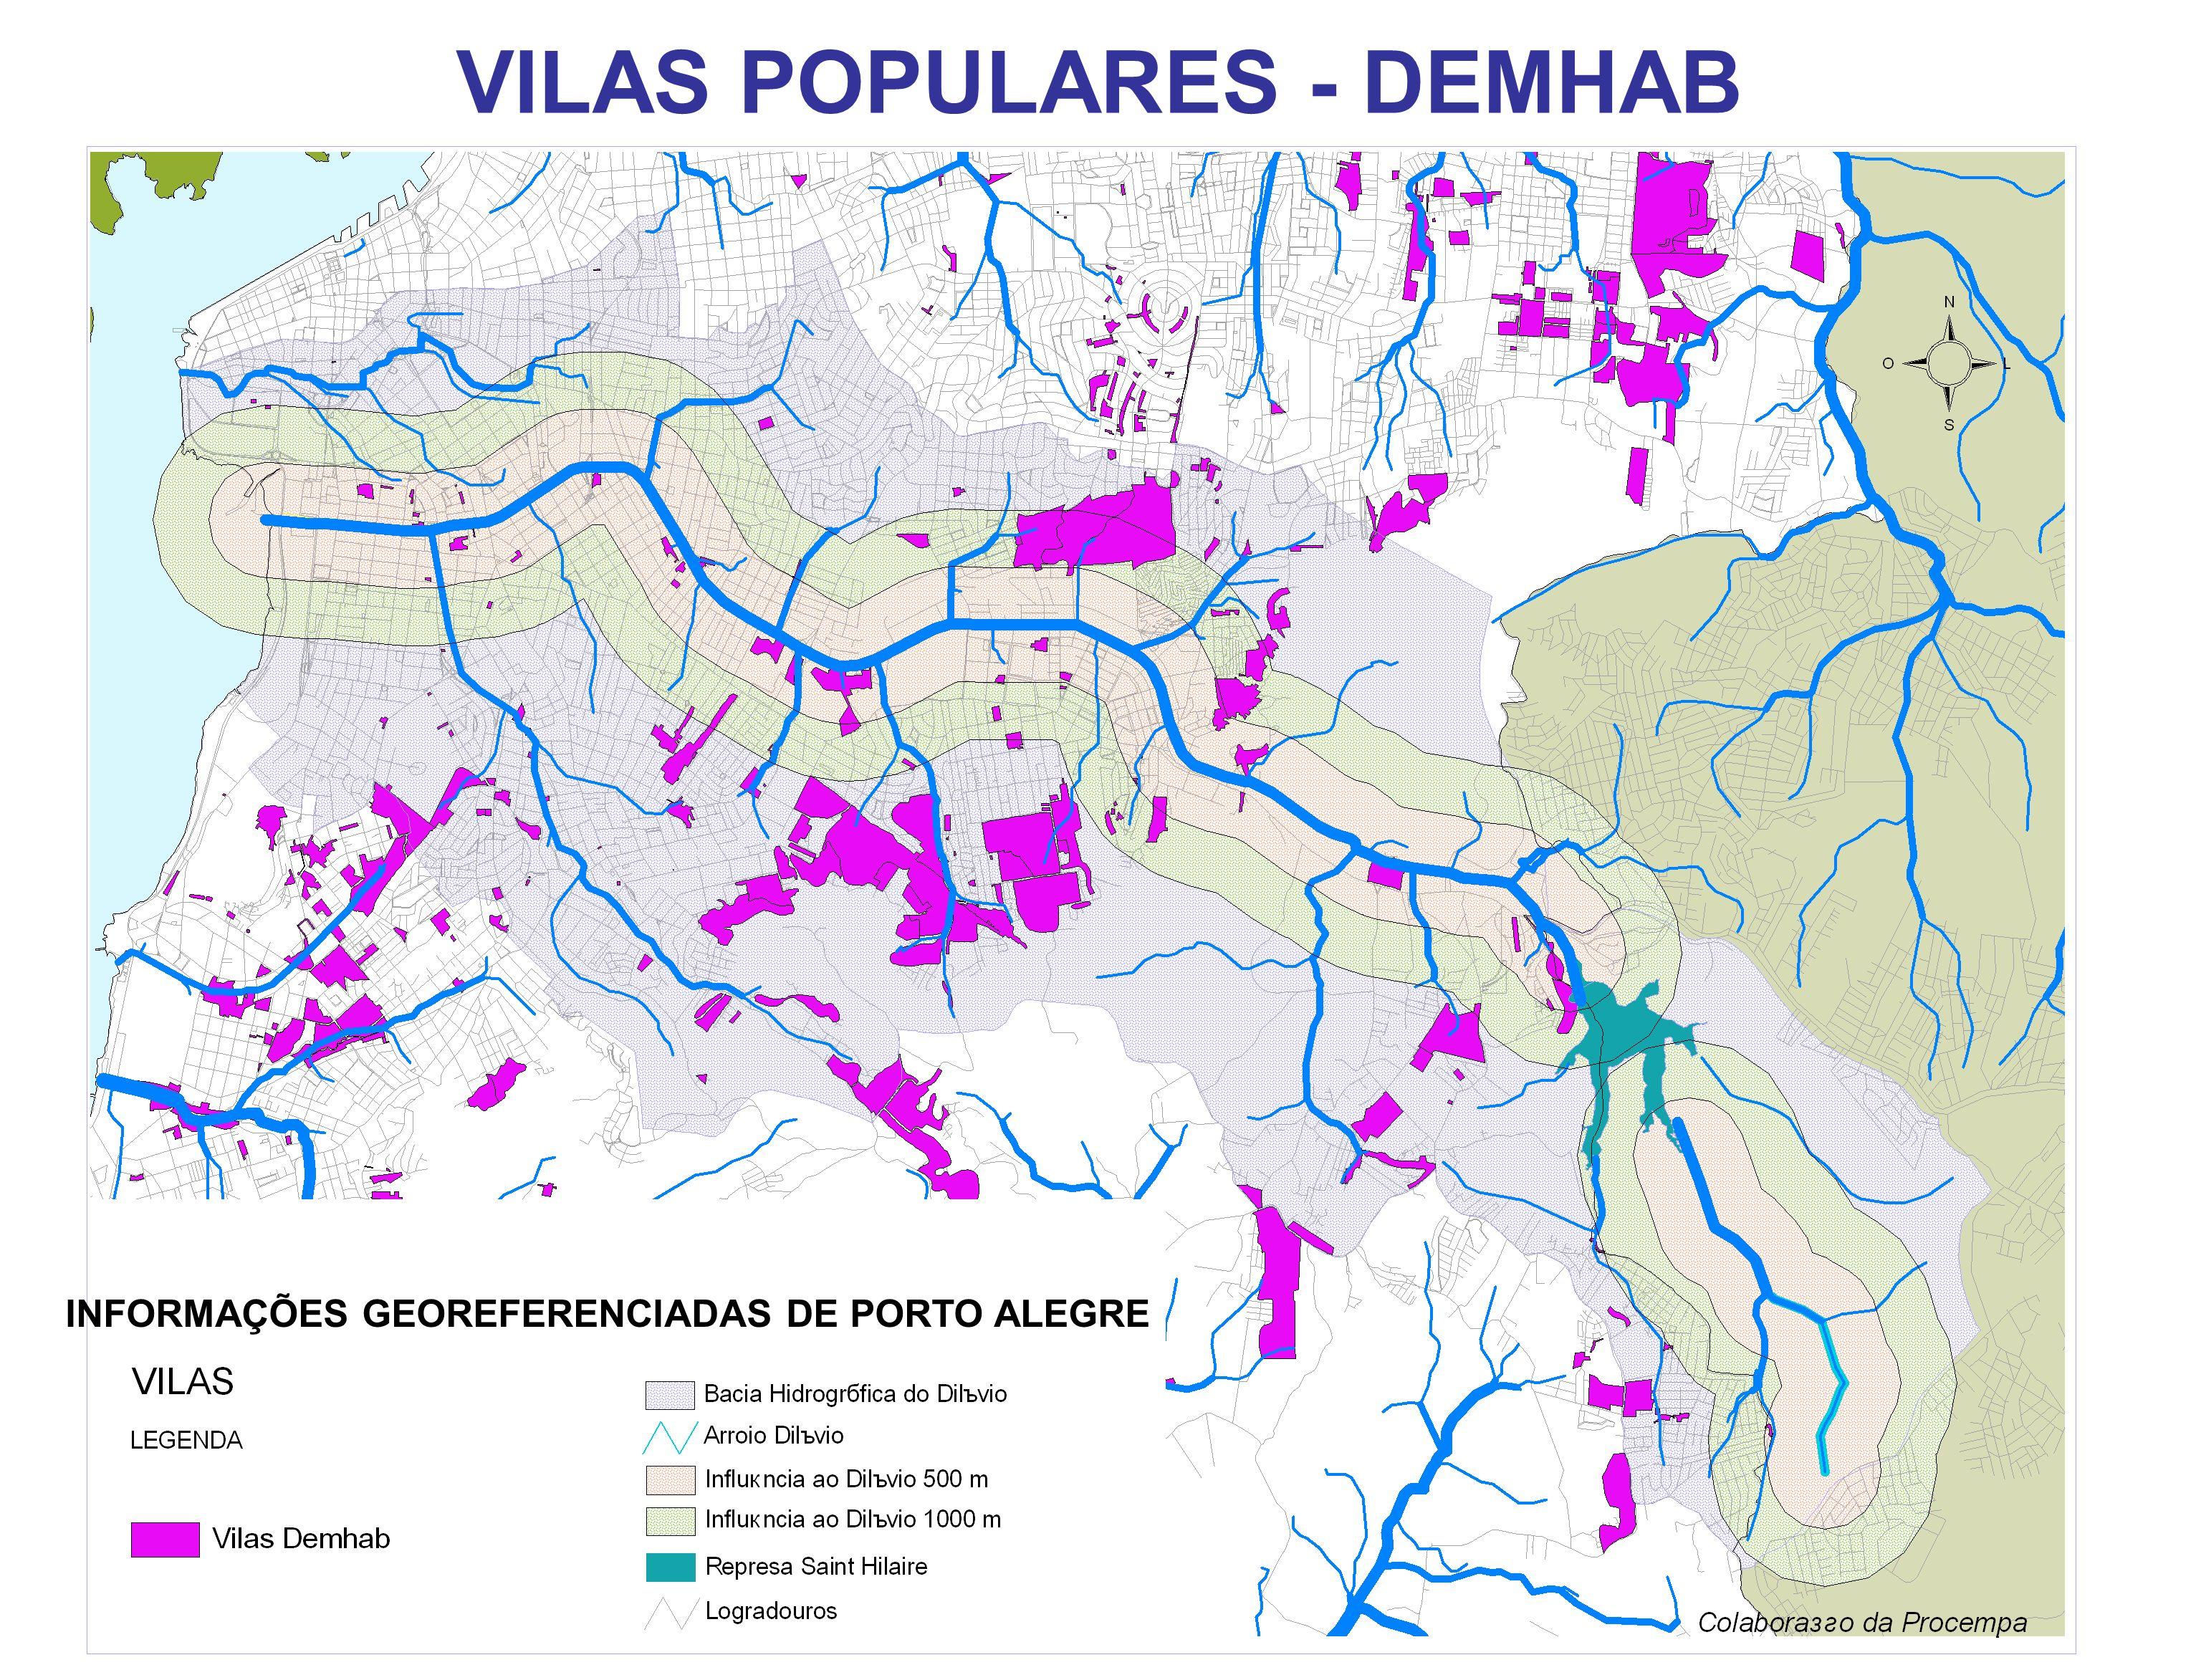 INFORMAÇÕES GEOREFERENCIADAS DE PORTO ALEGRE VILAS POPULARES - DEMHAB